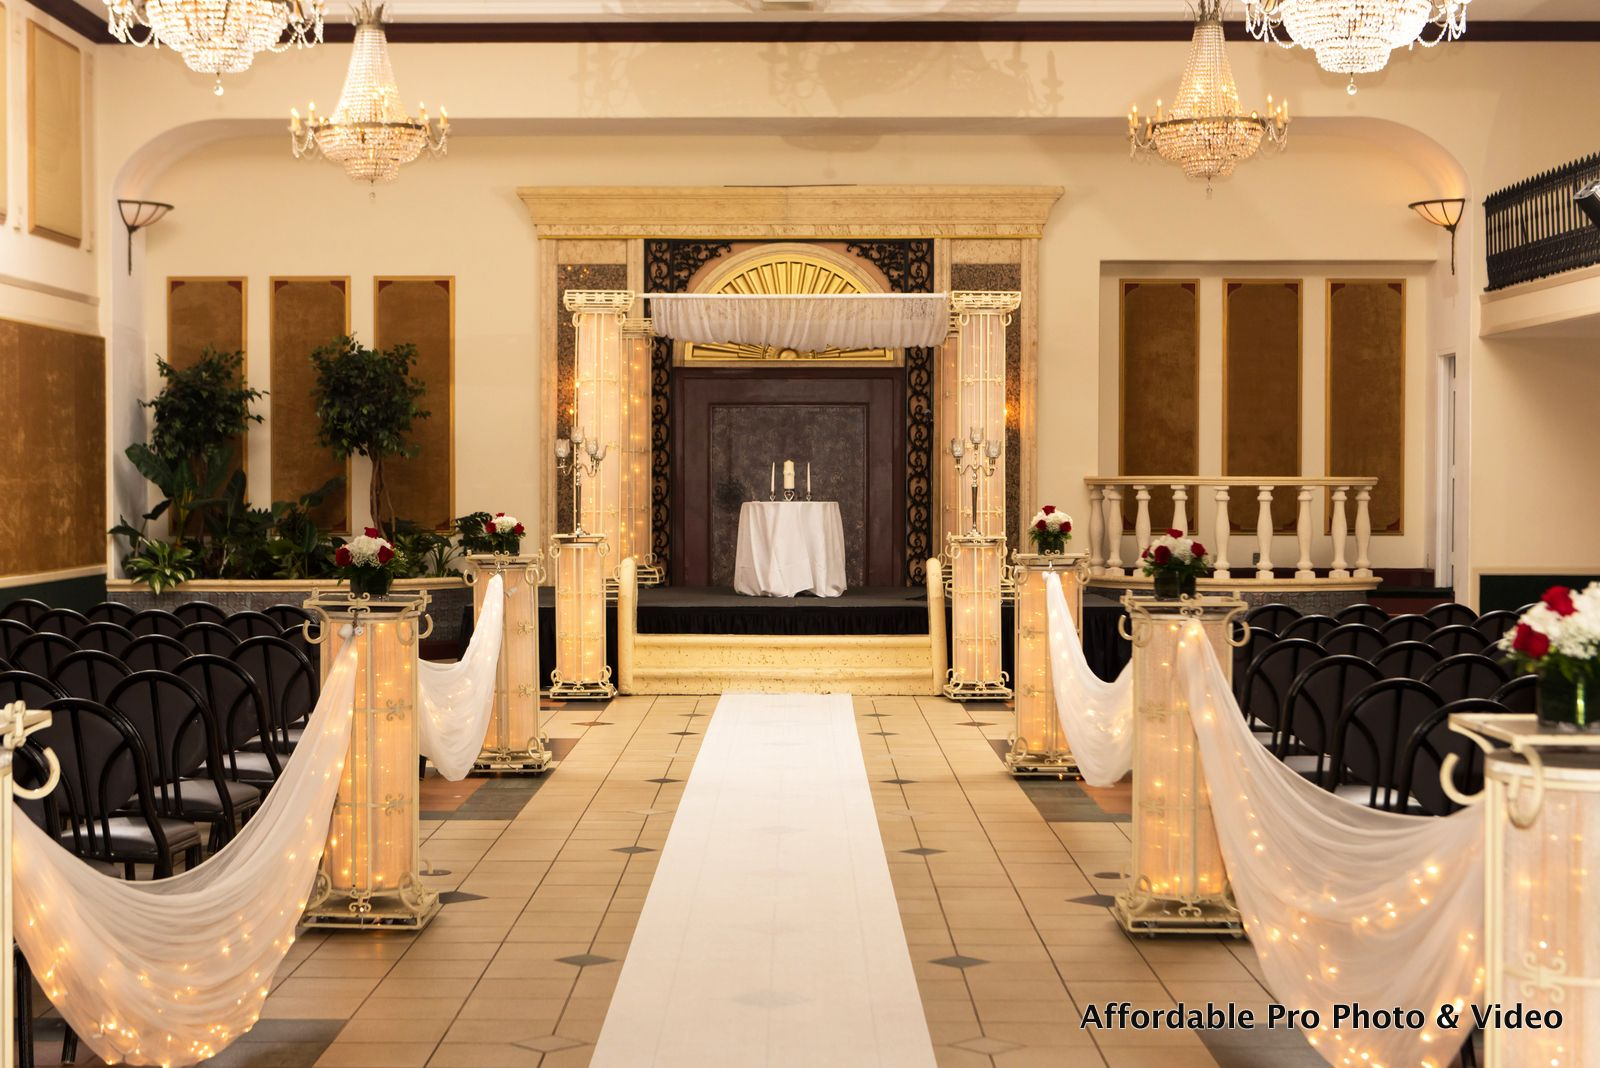 Ceremony area at The Signature Grand in Davie, FL